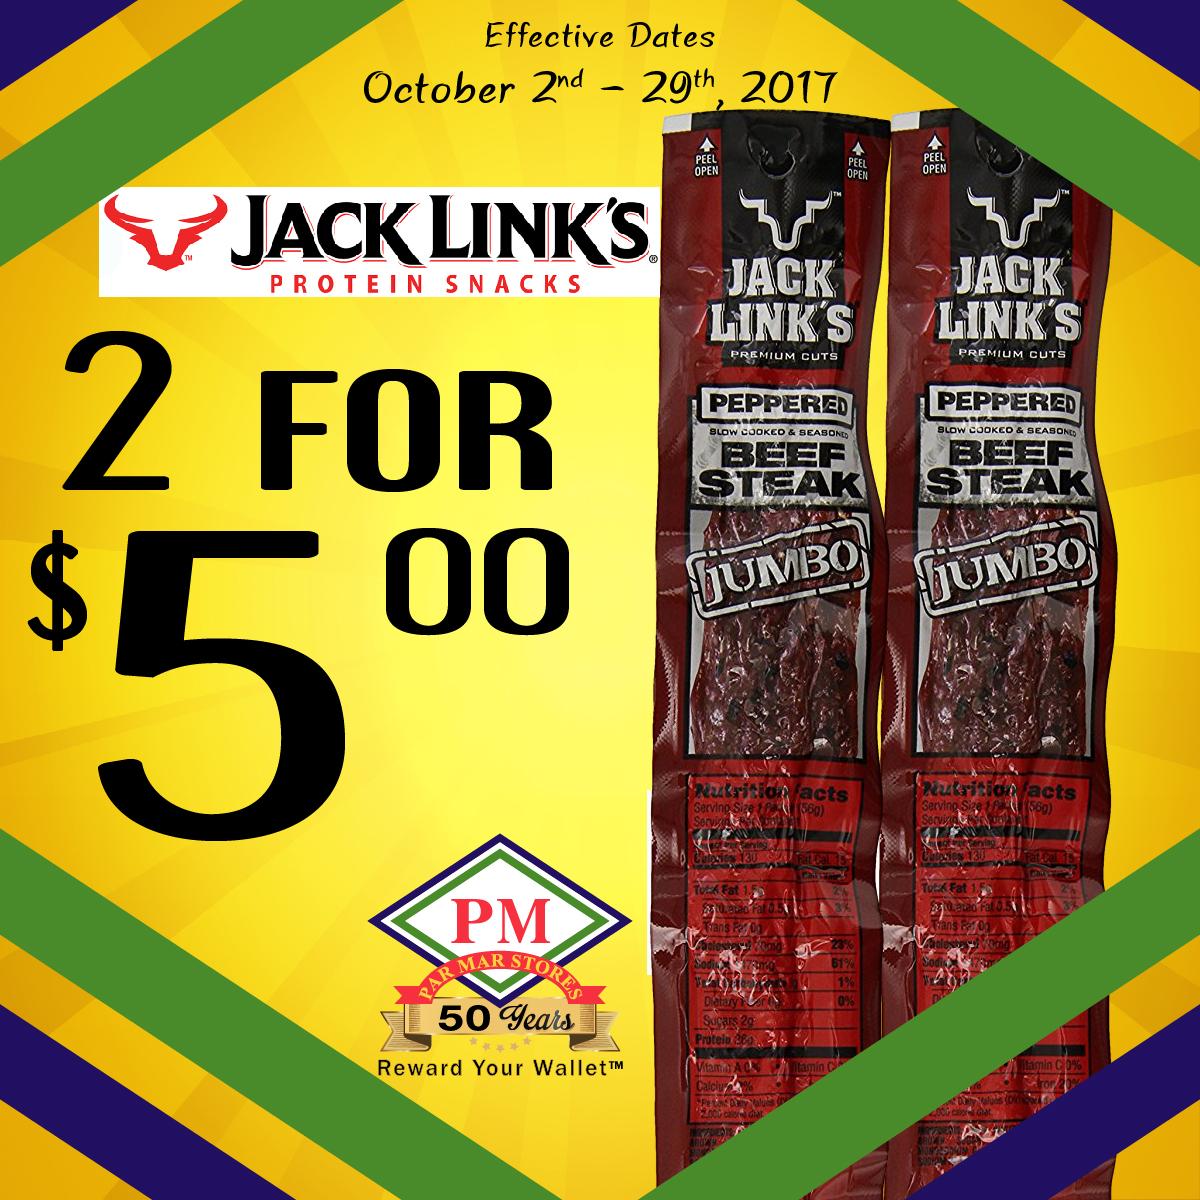 JackLinksJumbo-100